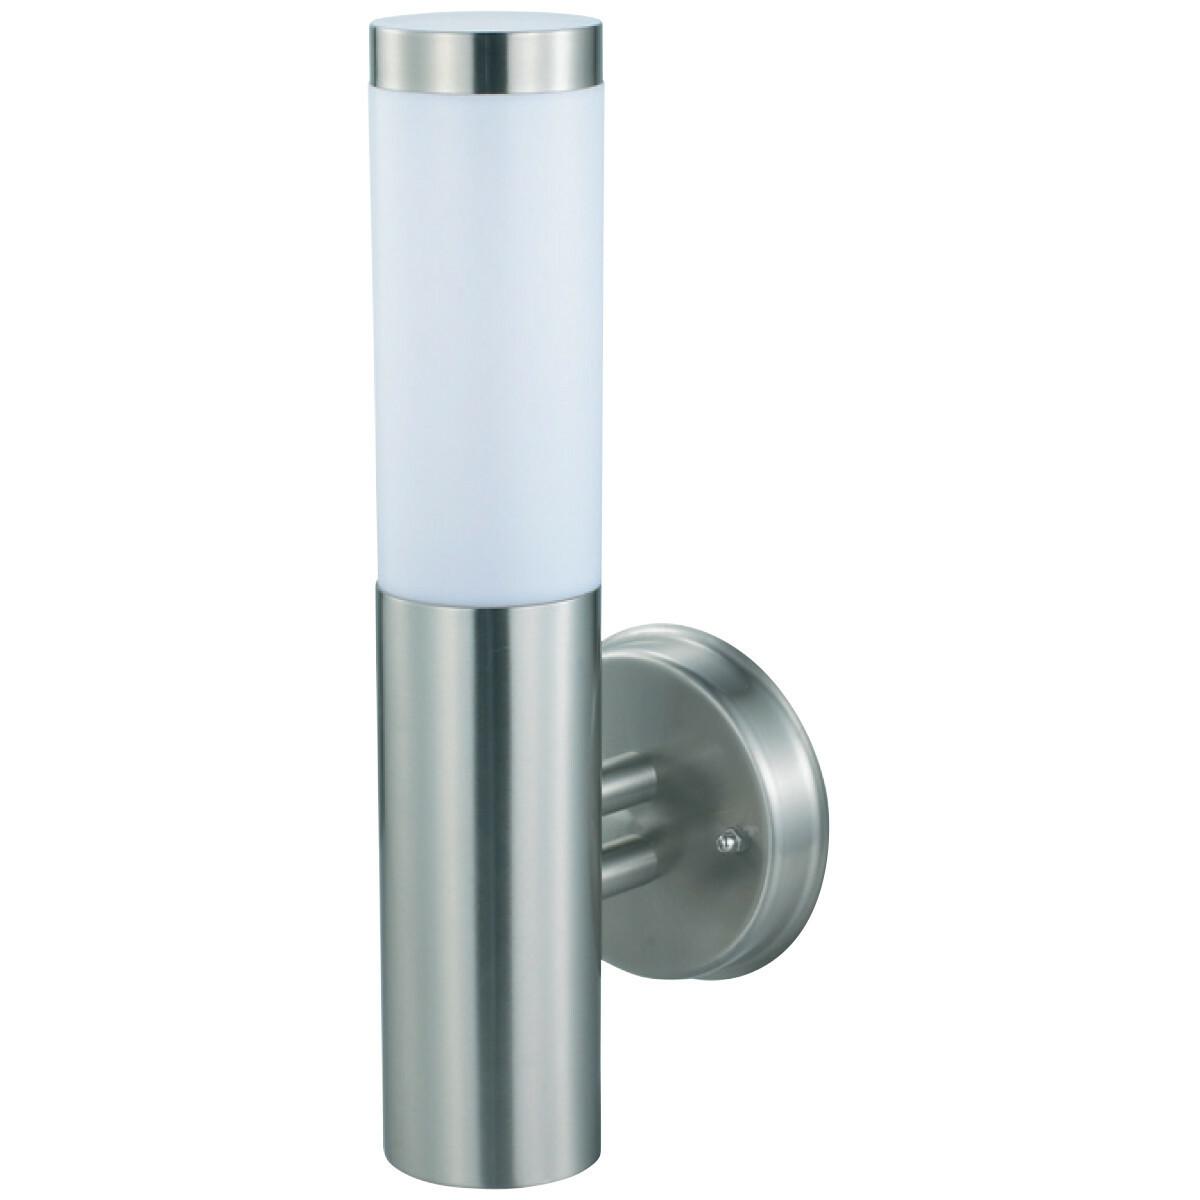 PHILIPS - LED Tuinverlichting - Wandlamp Buiten - CorePro LEDbulb 827 A60 - Laurea 2 - E27 Fitting -